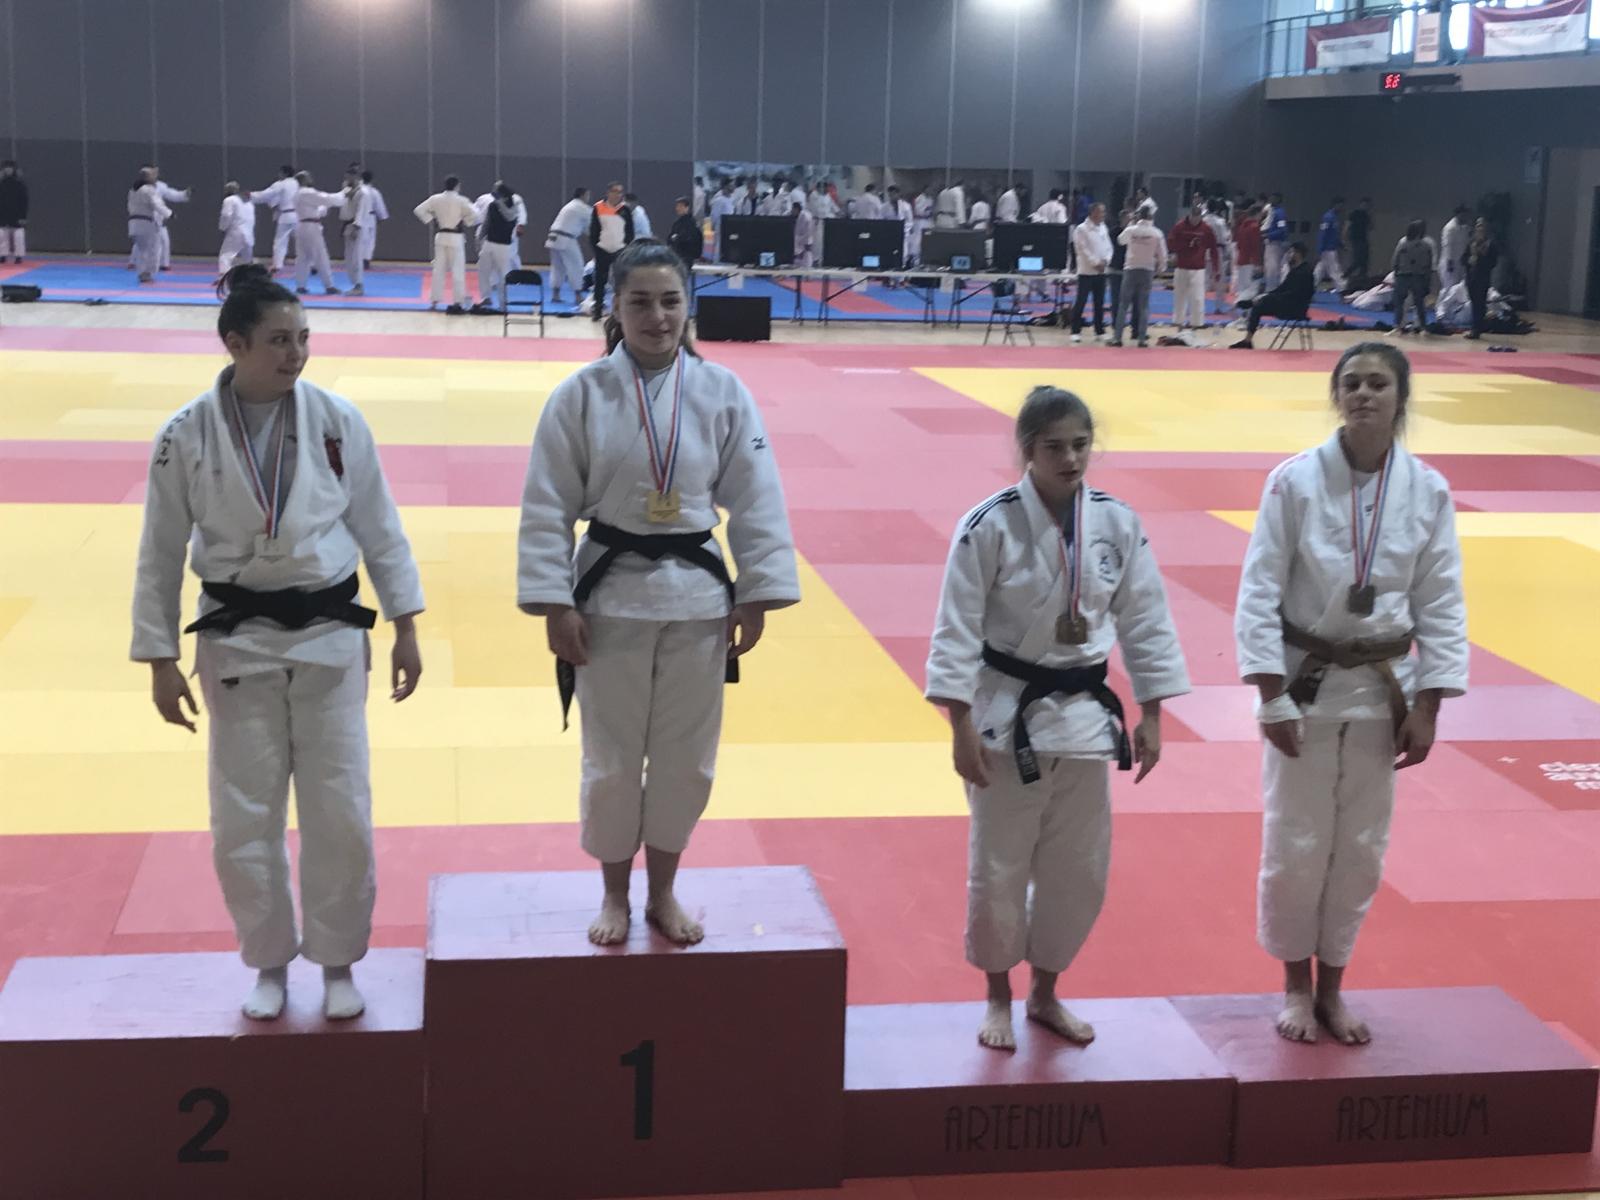 France Juniors Jujitsu 2019